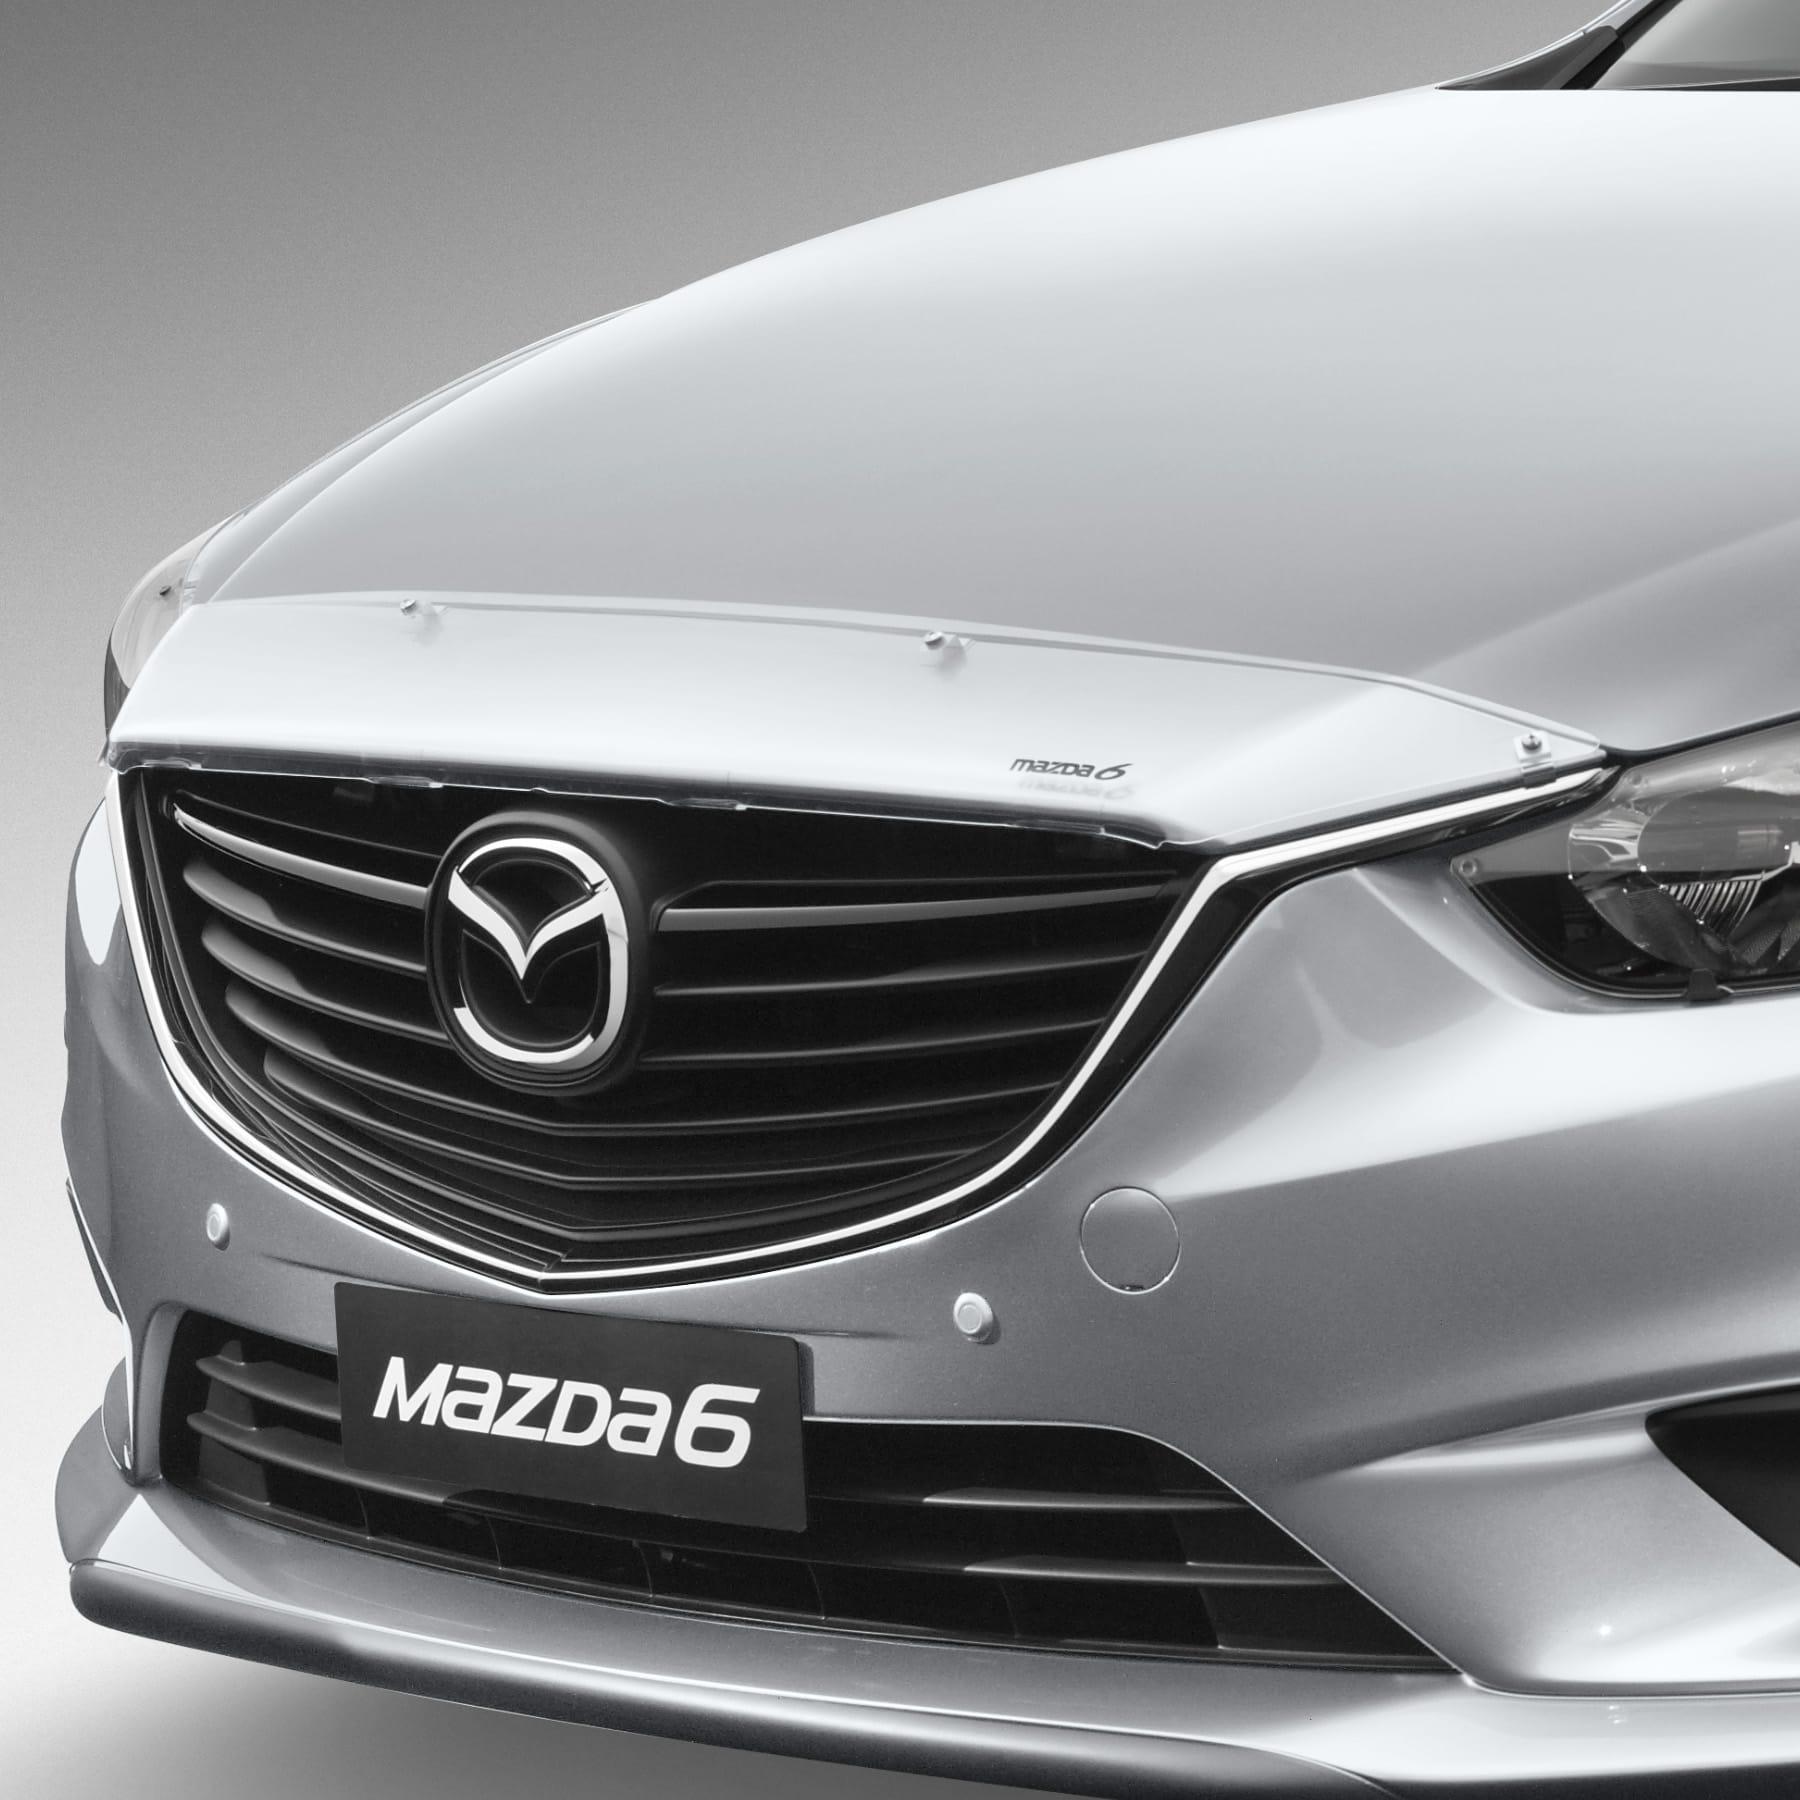 Genuine Mazda 6 GJ GL Clear Bonnet Protector Mazda6 2013 - Current GJ11ACBP